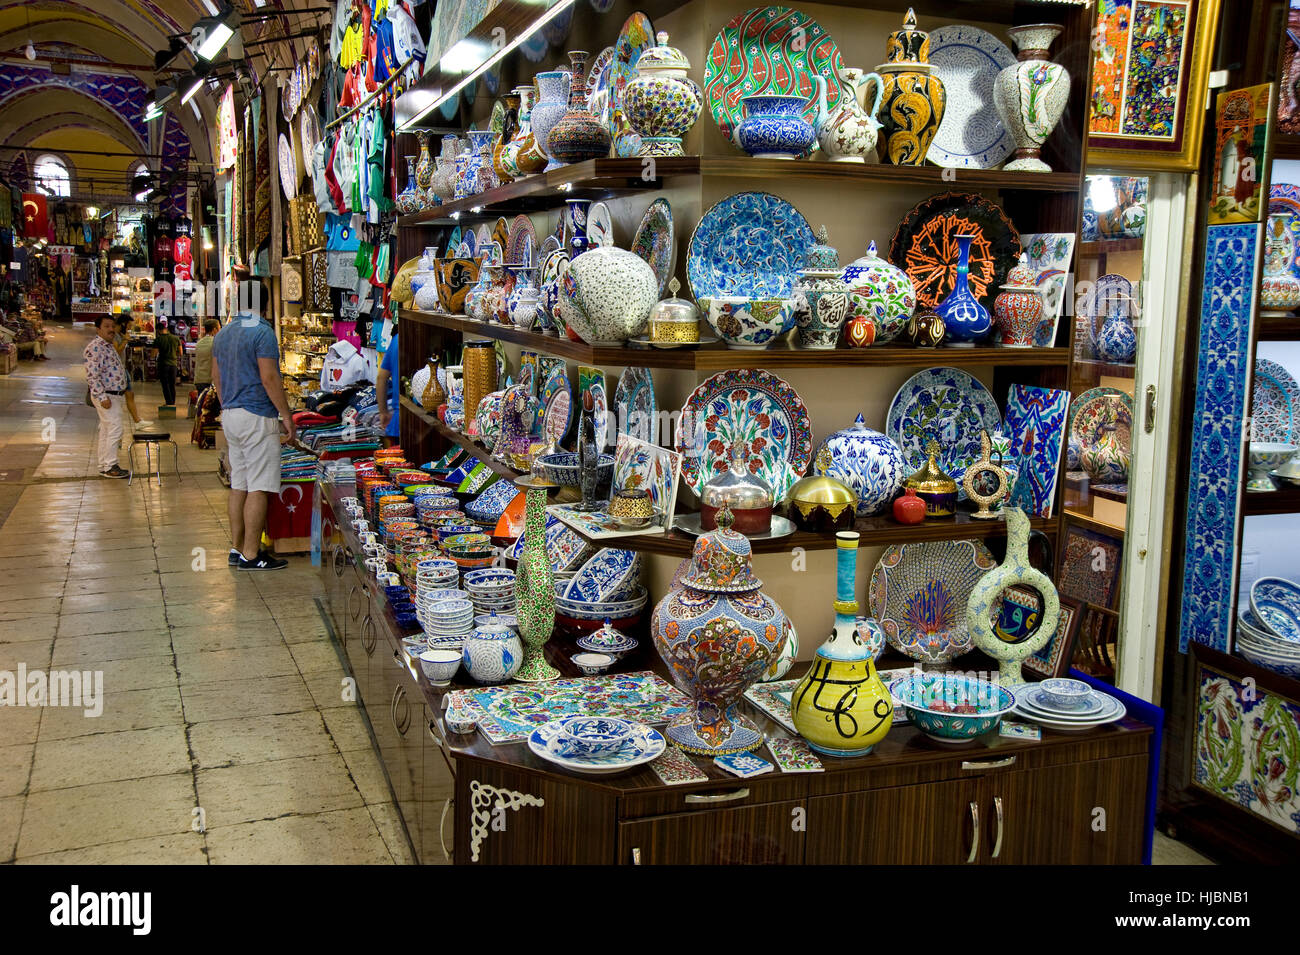 Shopping In Turkey Immagini Shopping In Turkey Fotos Stock Alamy